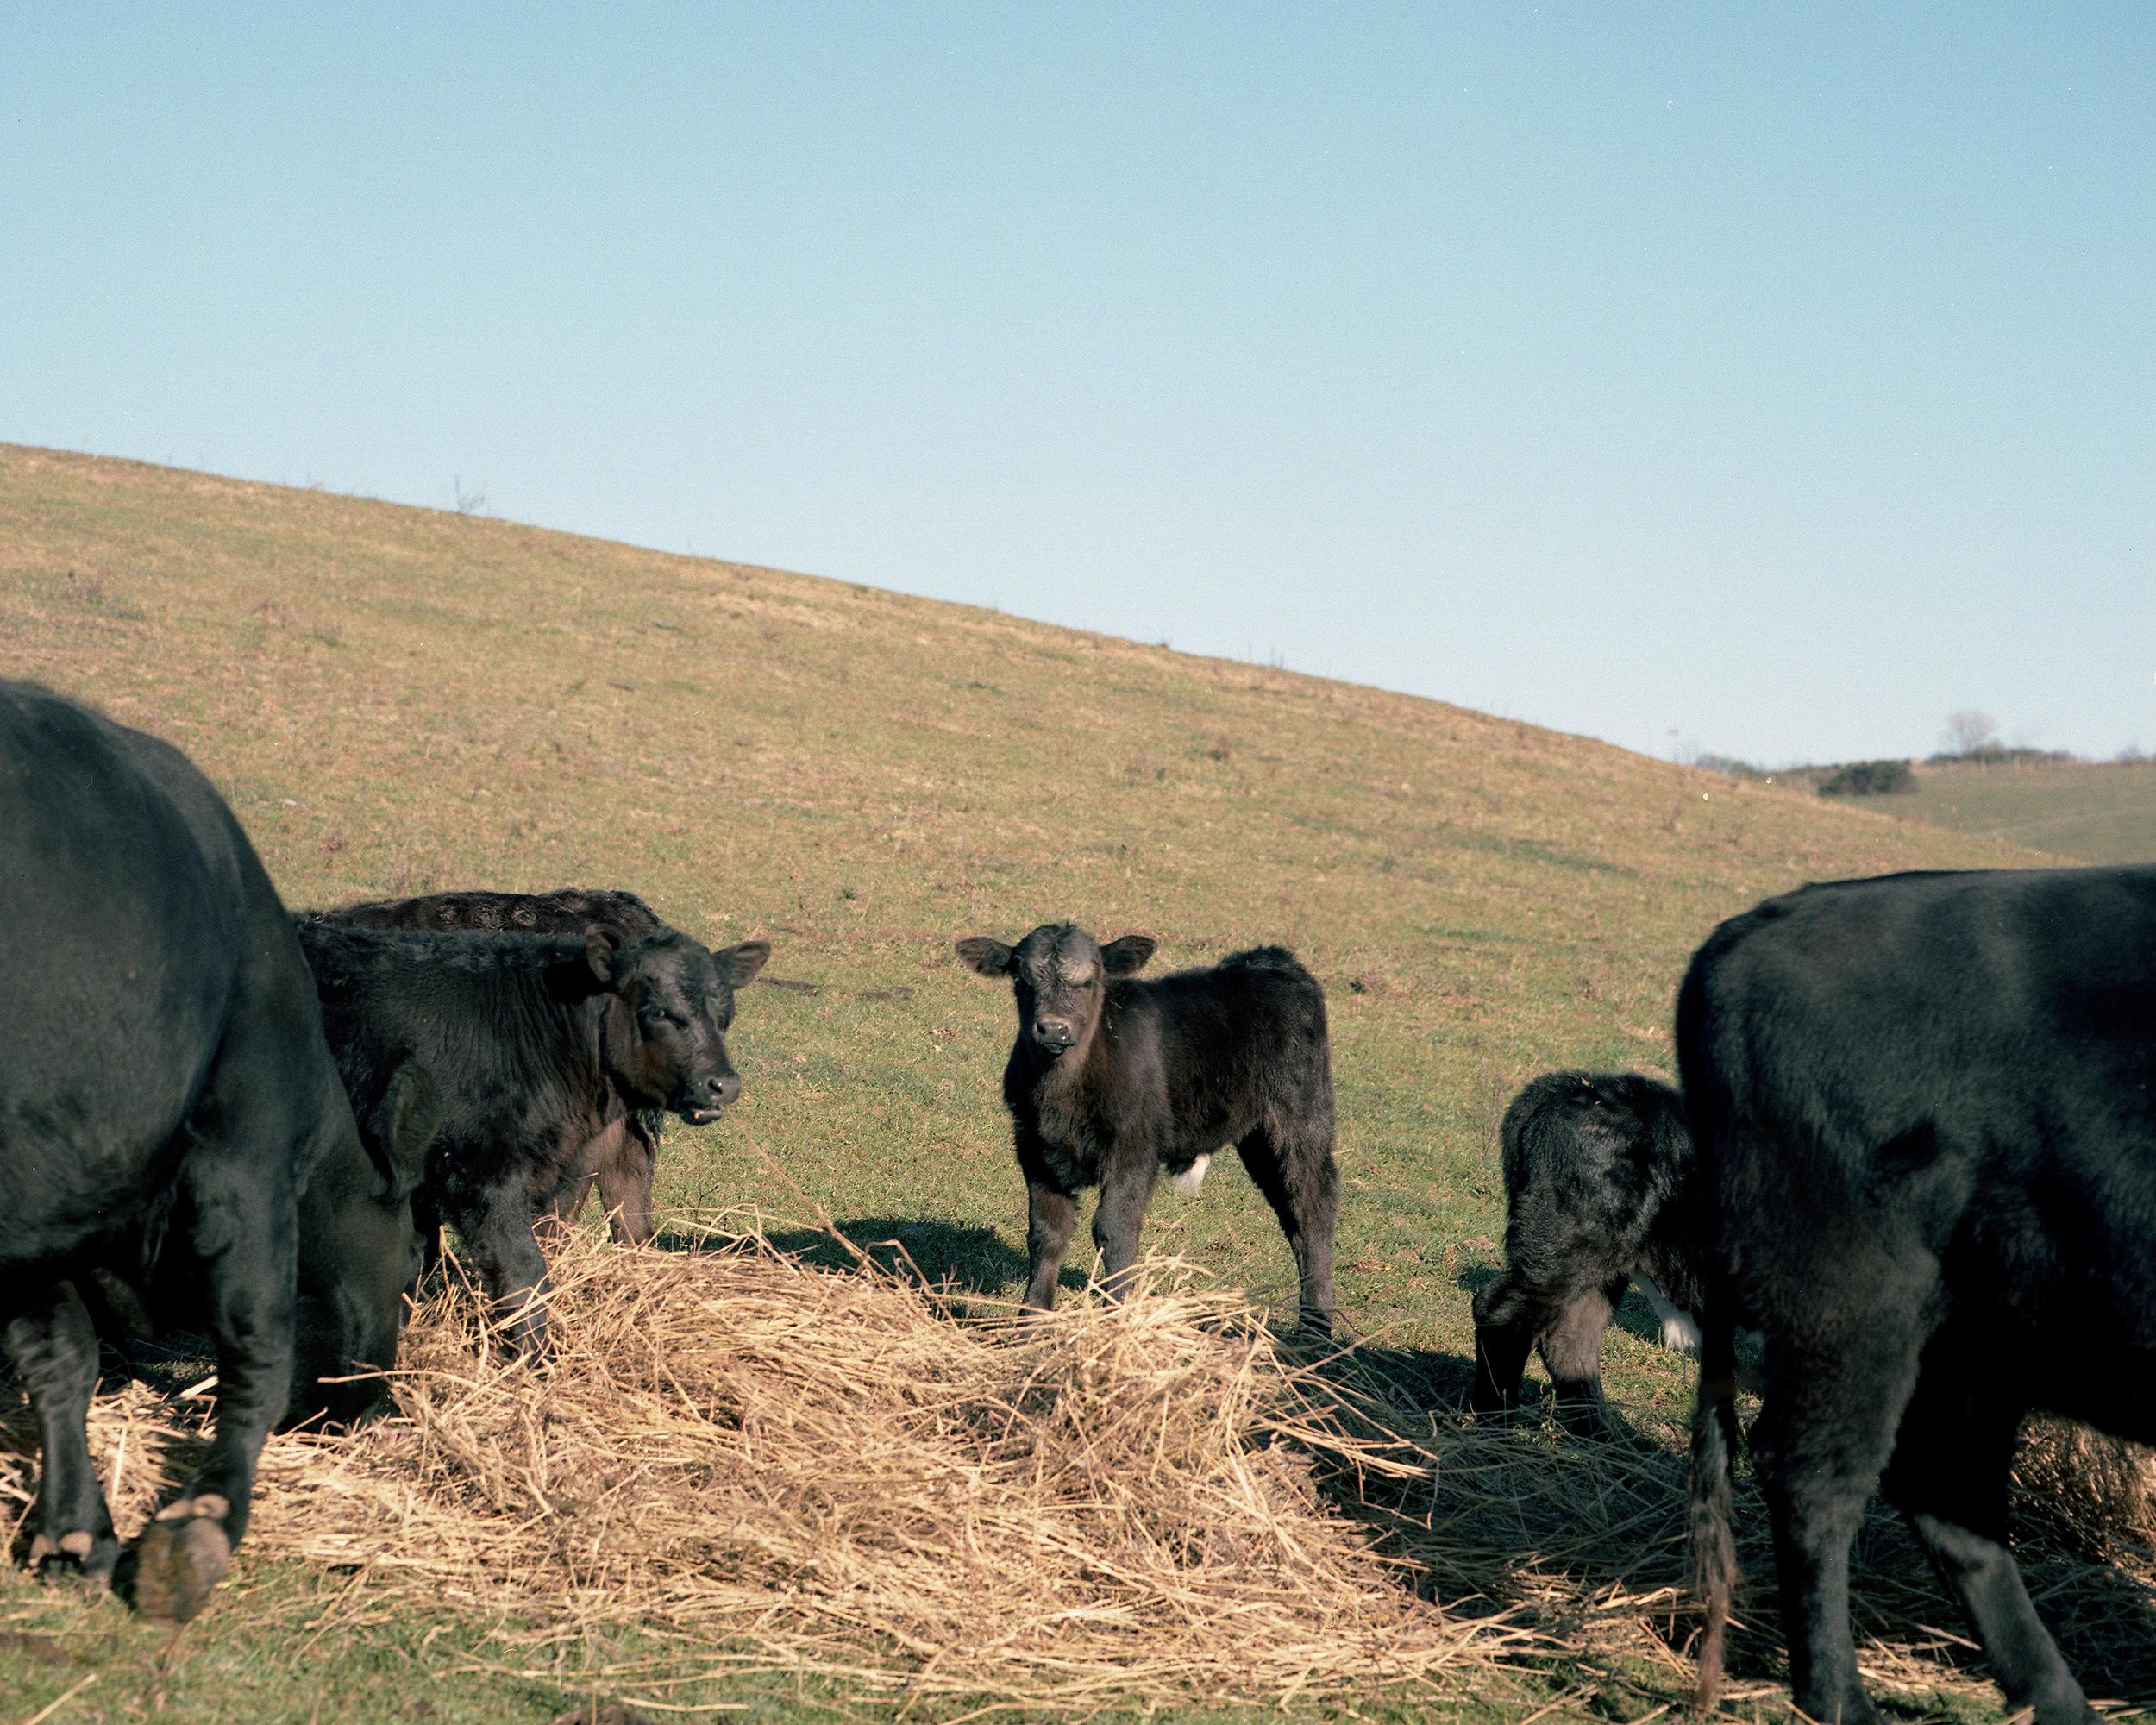 Calf at Feeding Time